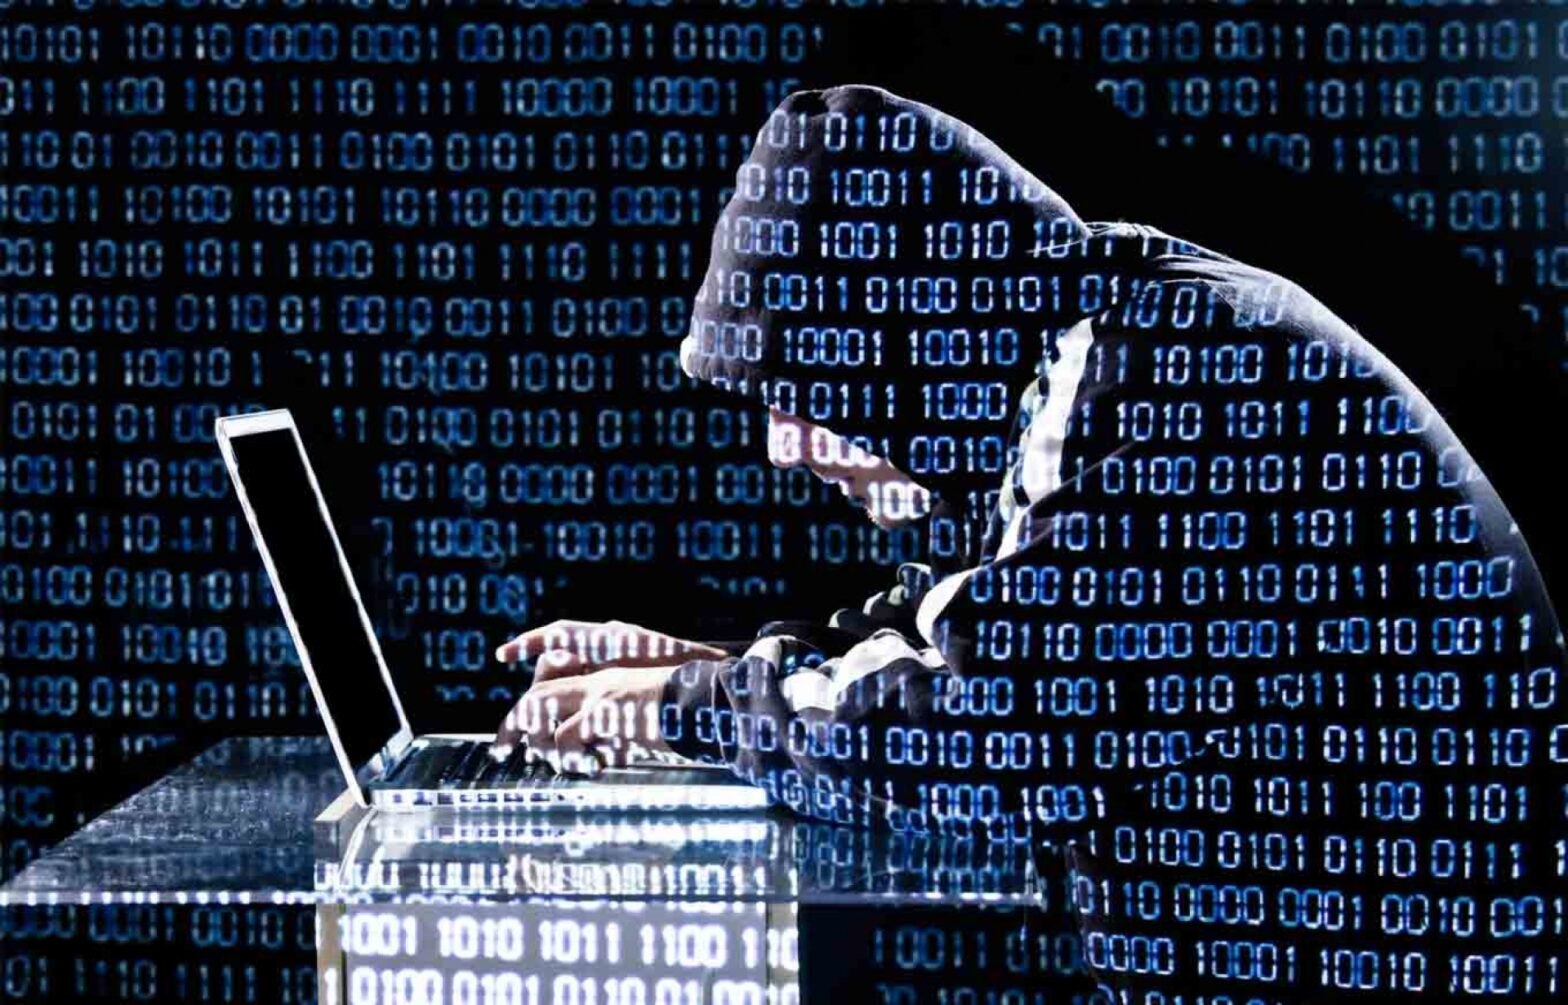 Data Breach Preparedness Plan - Why You Need One